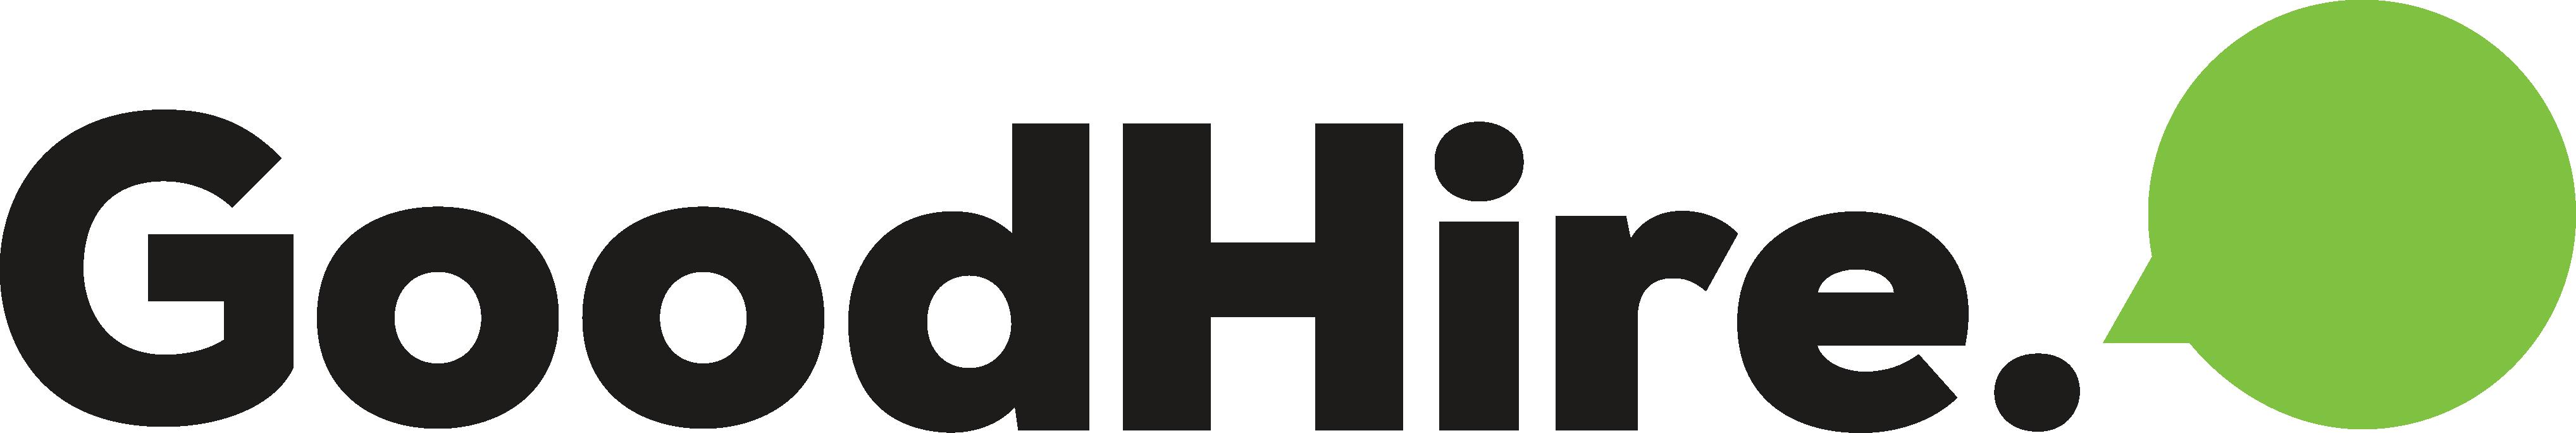 goodhire_logo